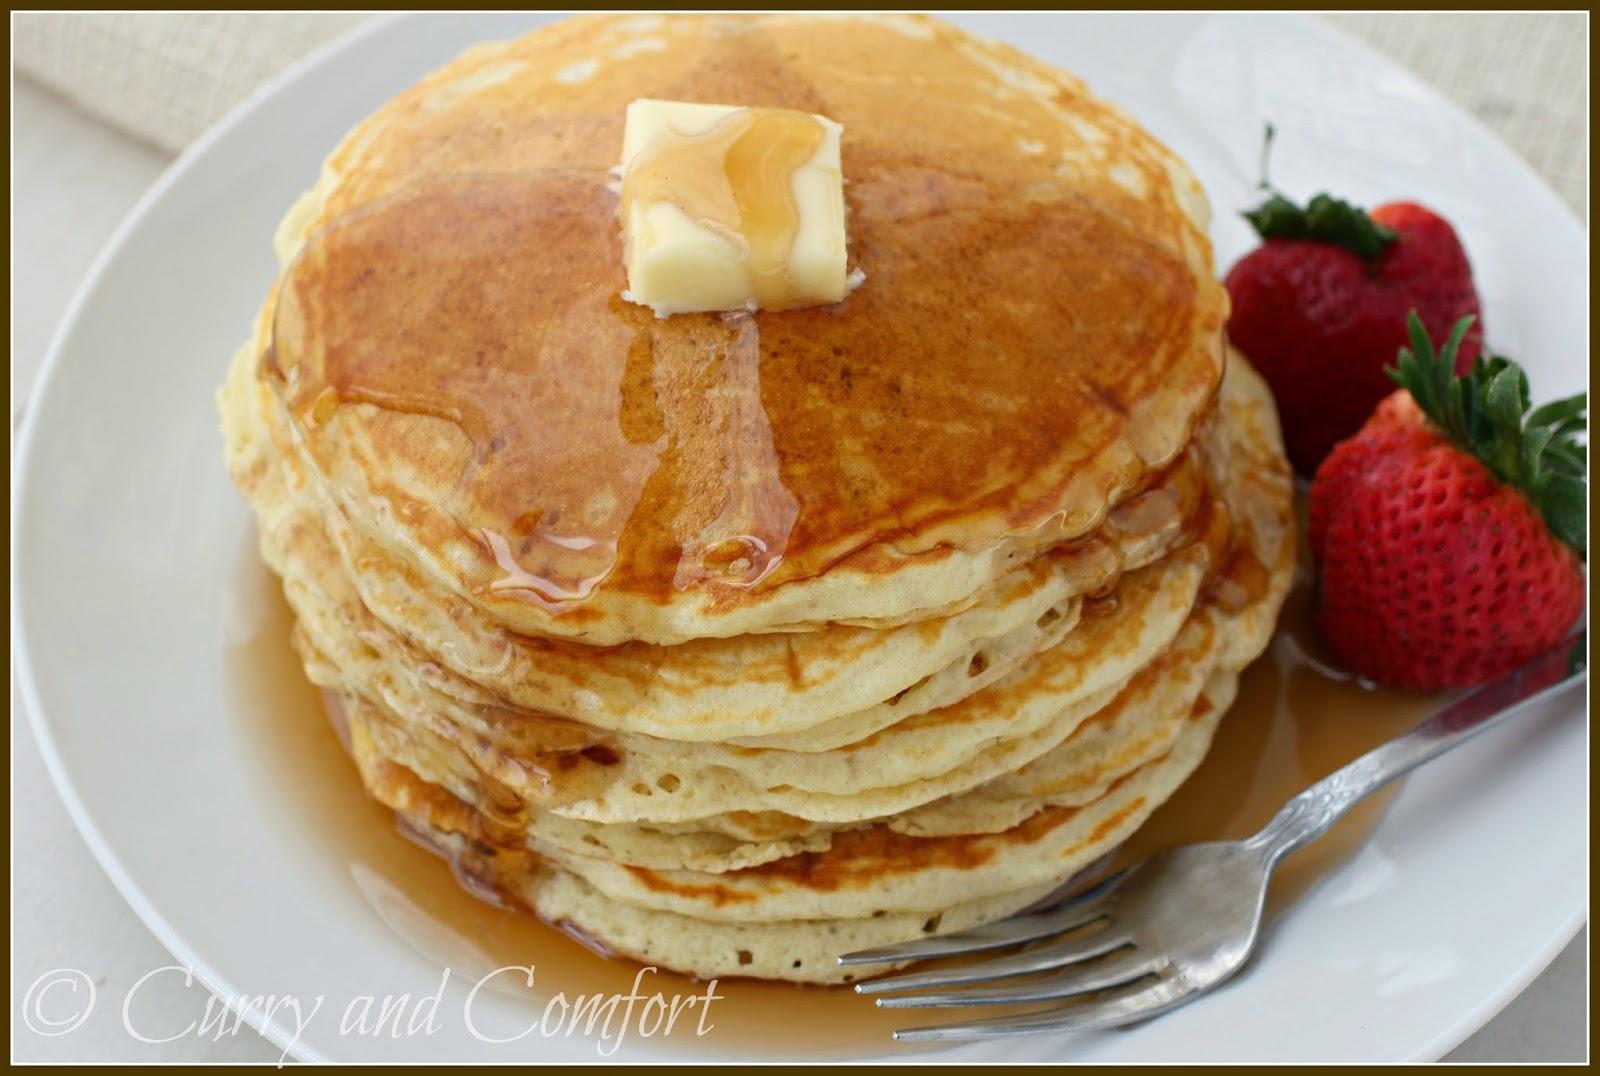 Kitchen Simmer: Buttermilk Pancakes for National Pancake Day